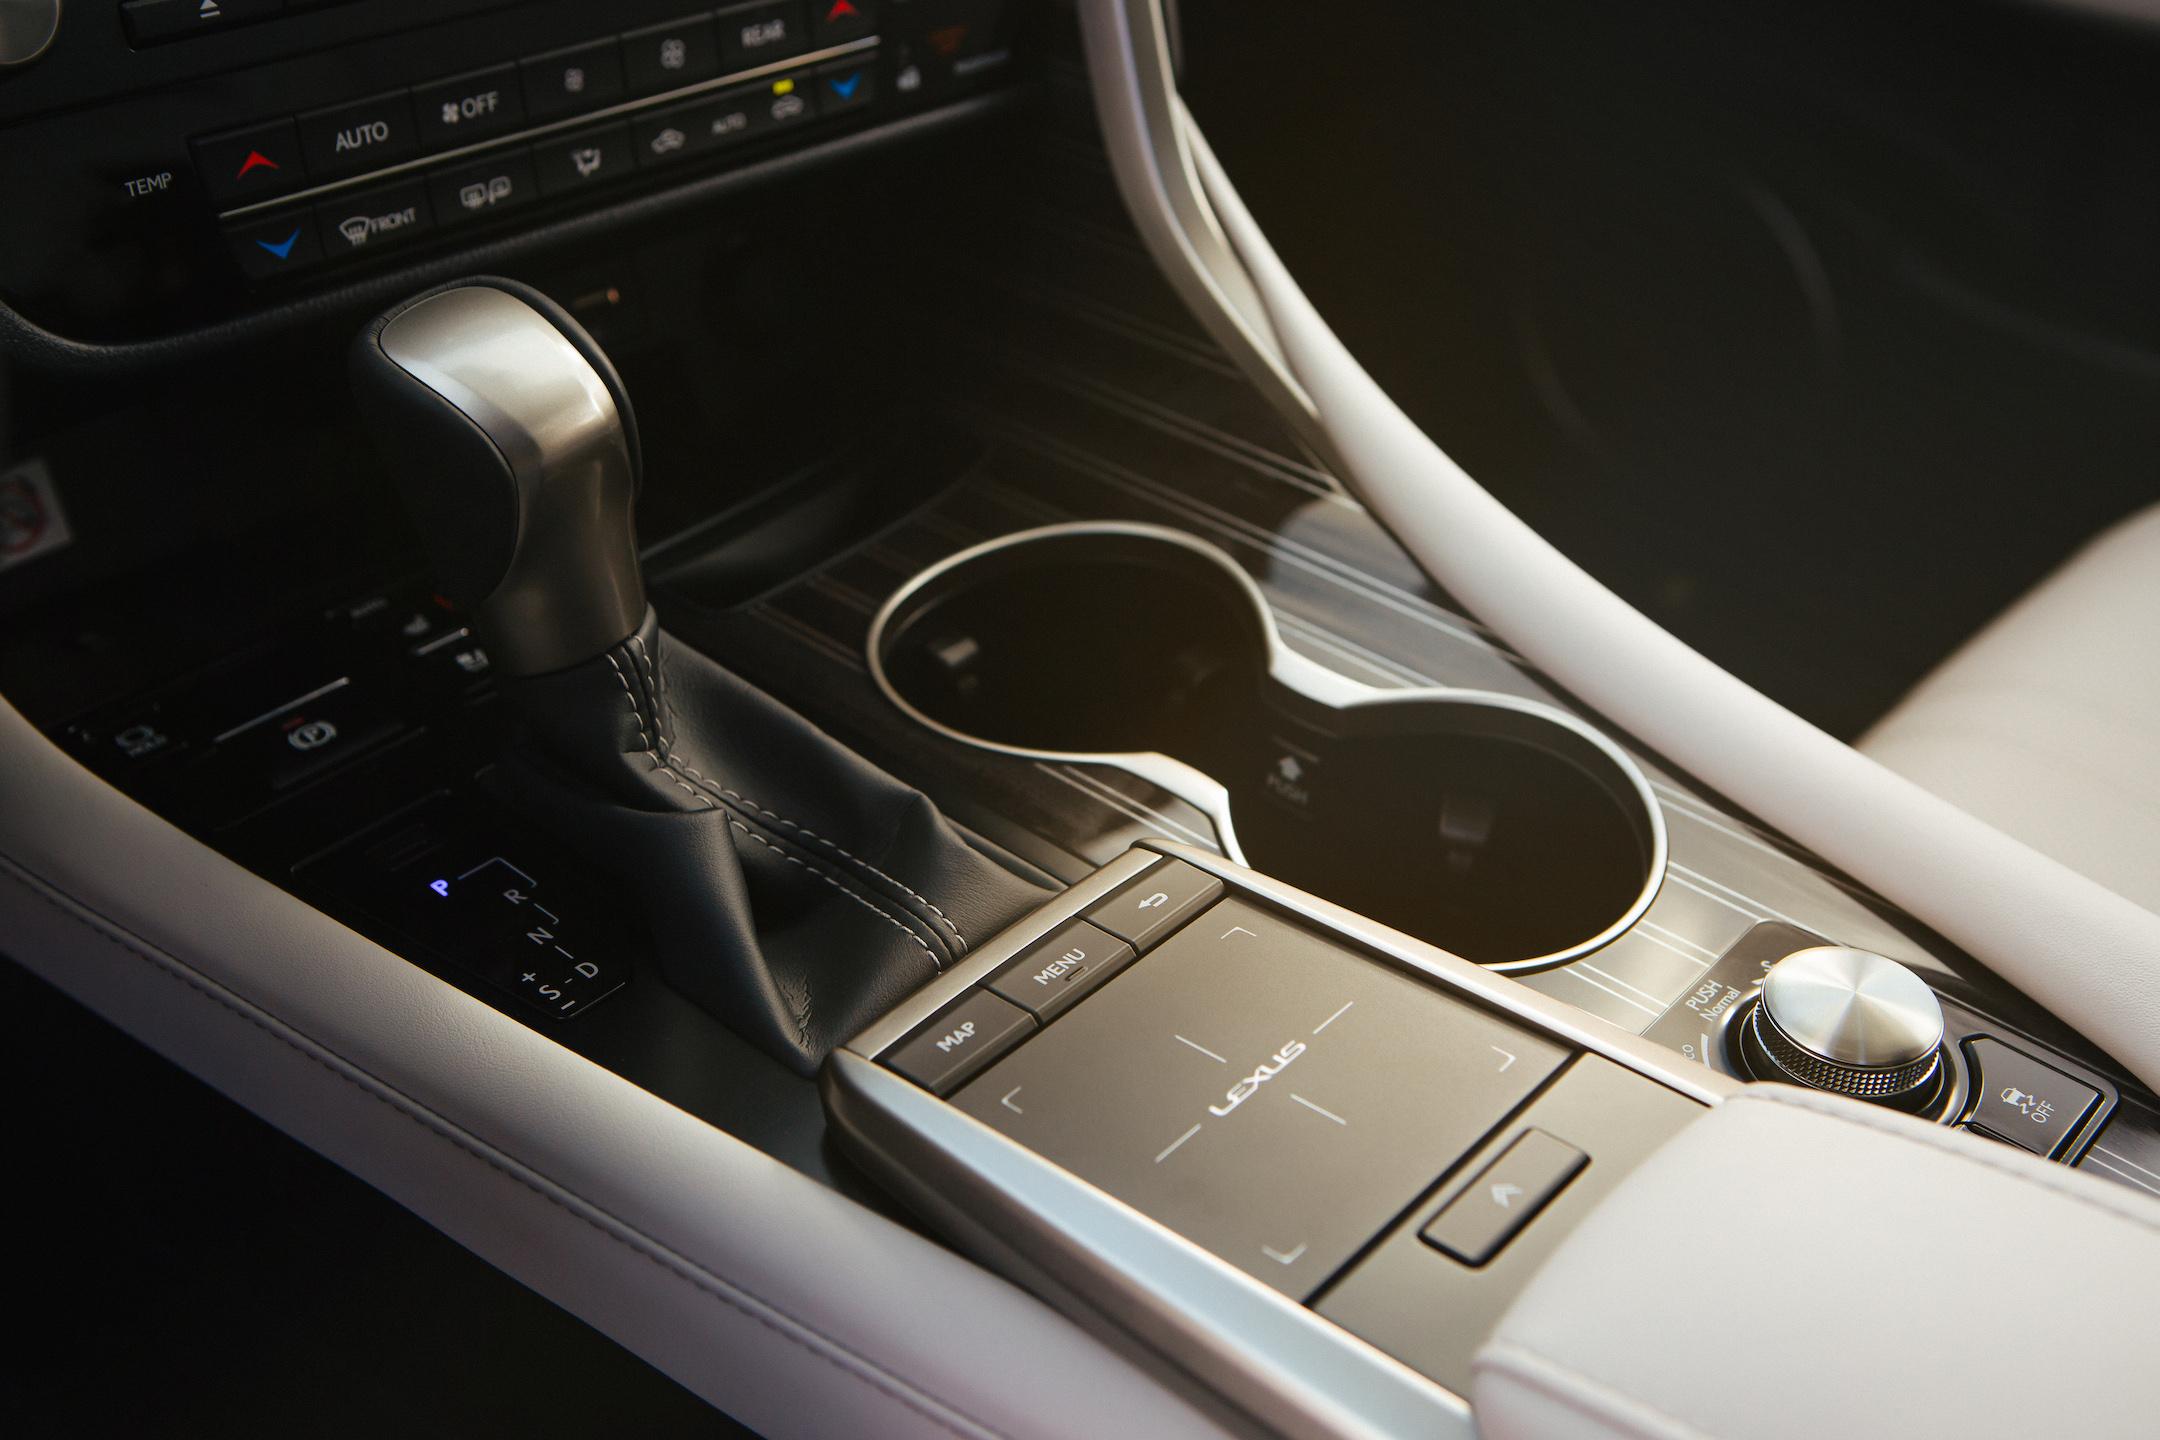 2020_Lexus_RX_450hL_16_0BC25A96F8C13A59D5201AD12FB94E9F10BC0F451